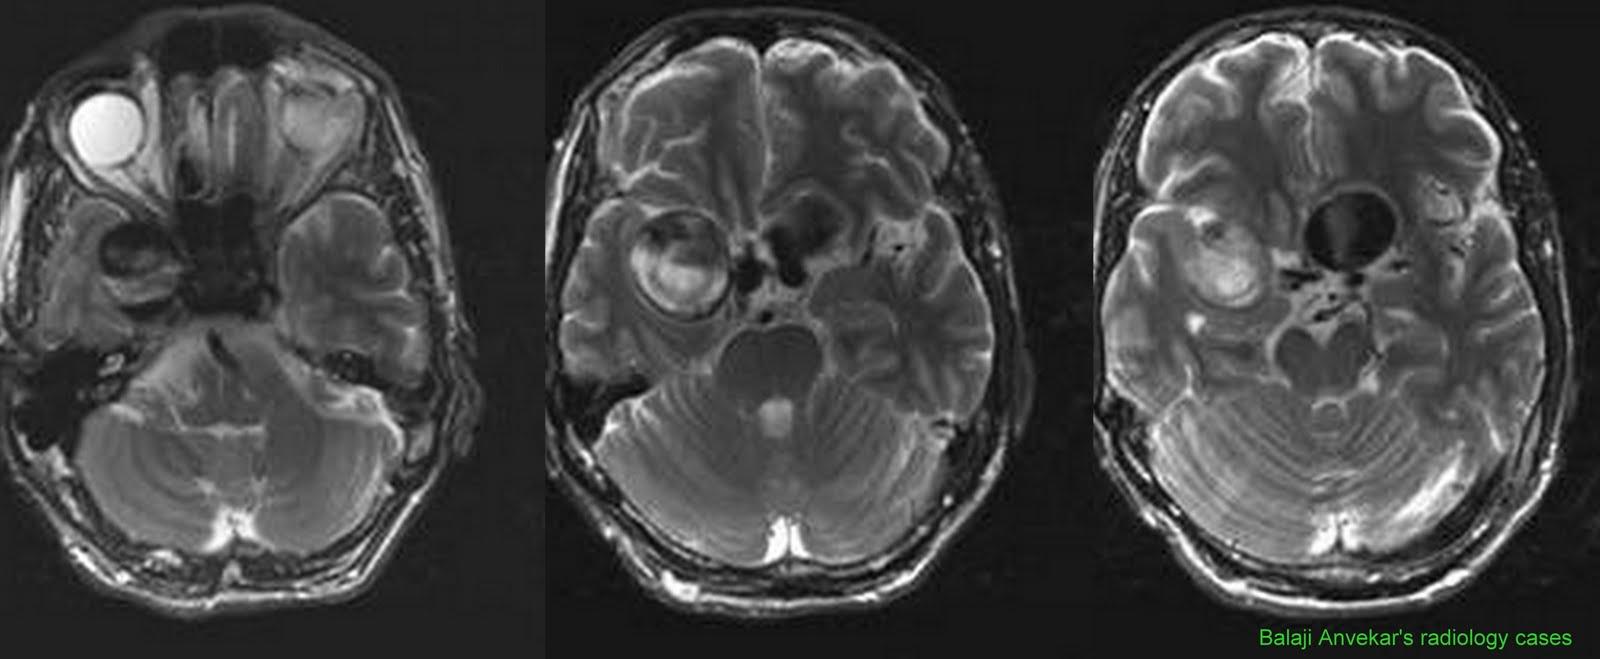 Dr Balaji Anvekar S Neuroradiology Cases Bilateral Ica